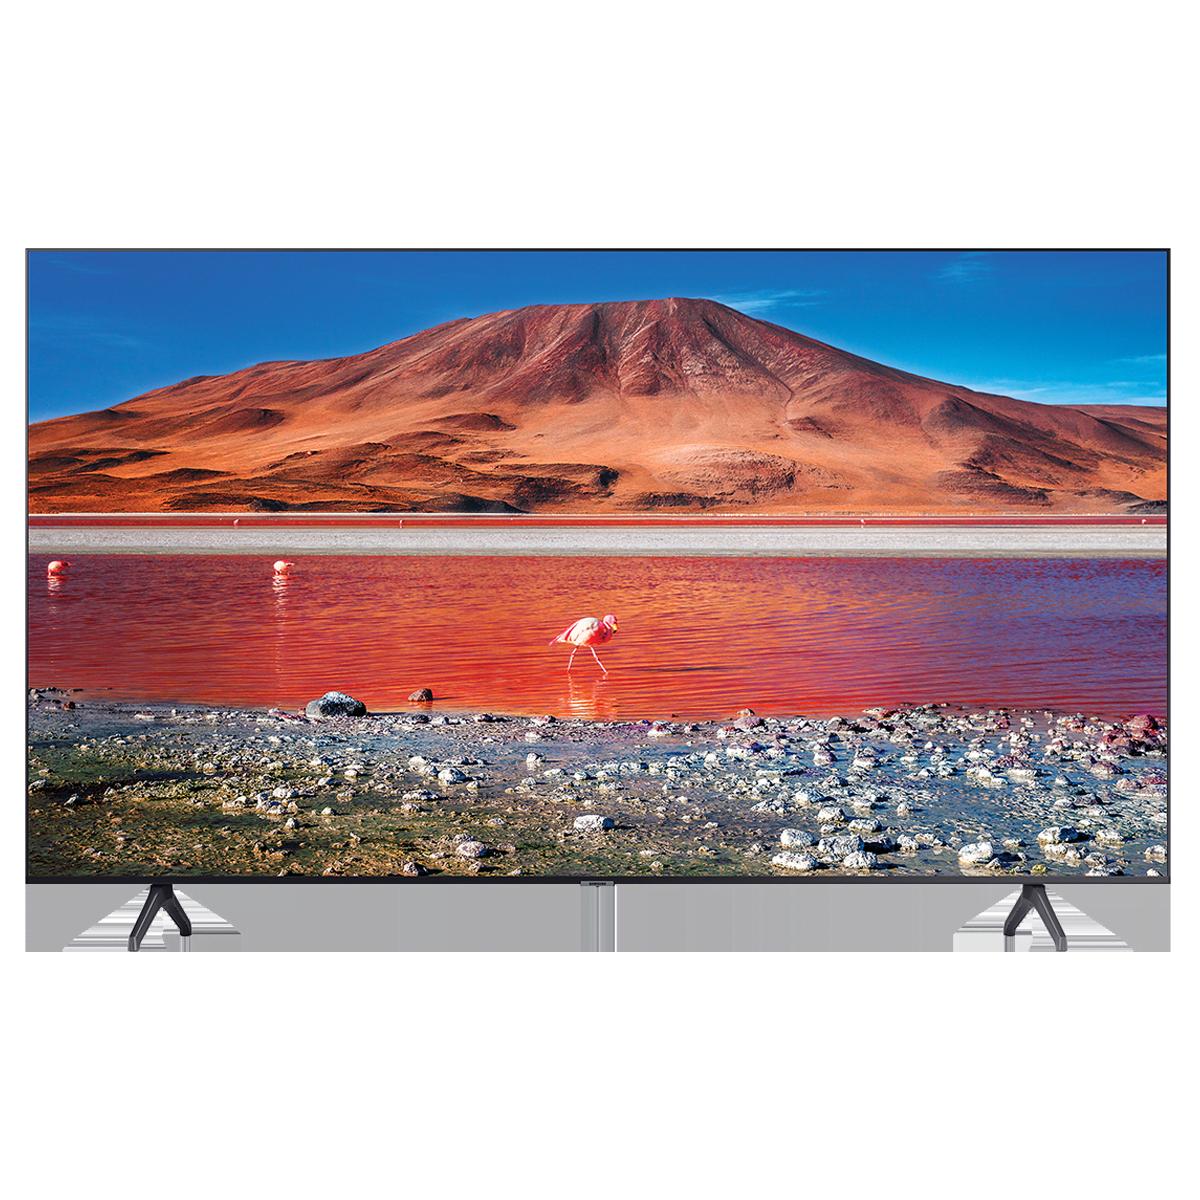 Samsung Series 7 125cm (50 Inch) 4K Ultra HD LED Smart TV (Crystal Display, UA50TU7200KXXL, Titan Grey)